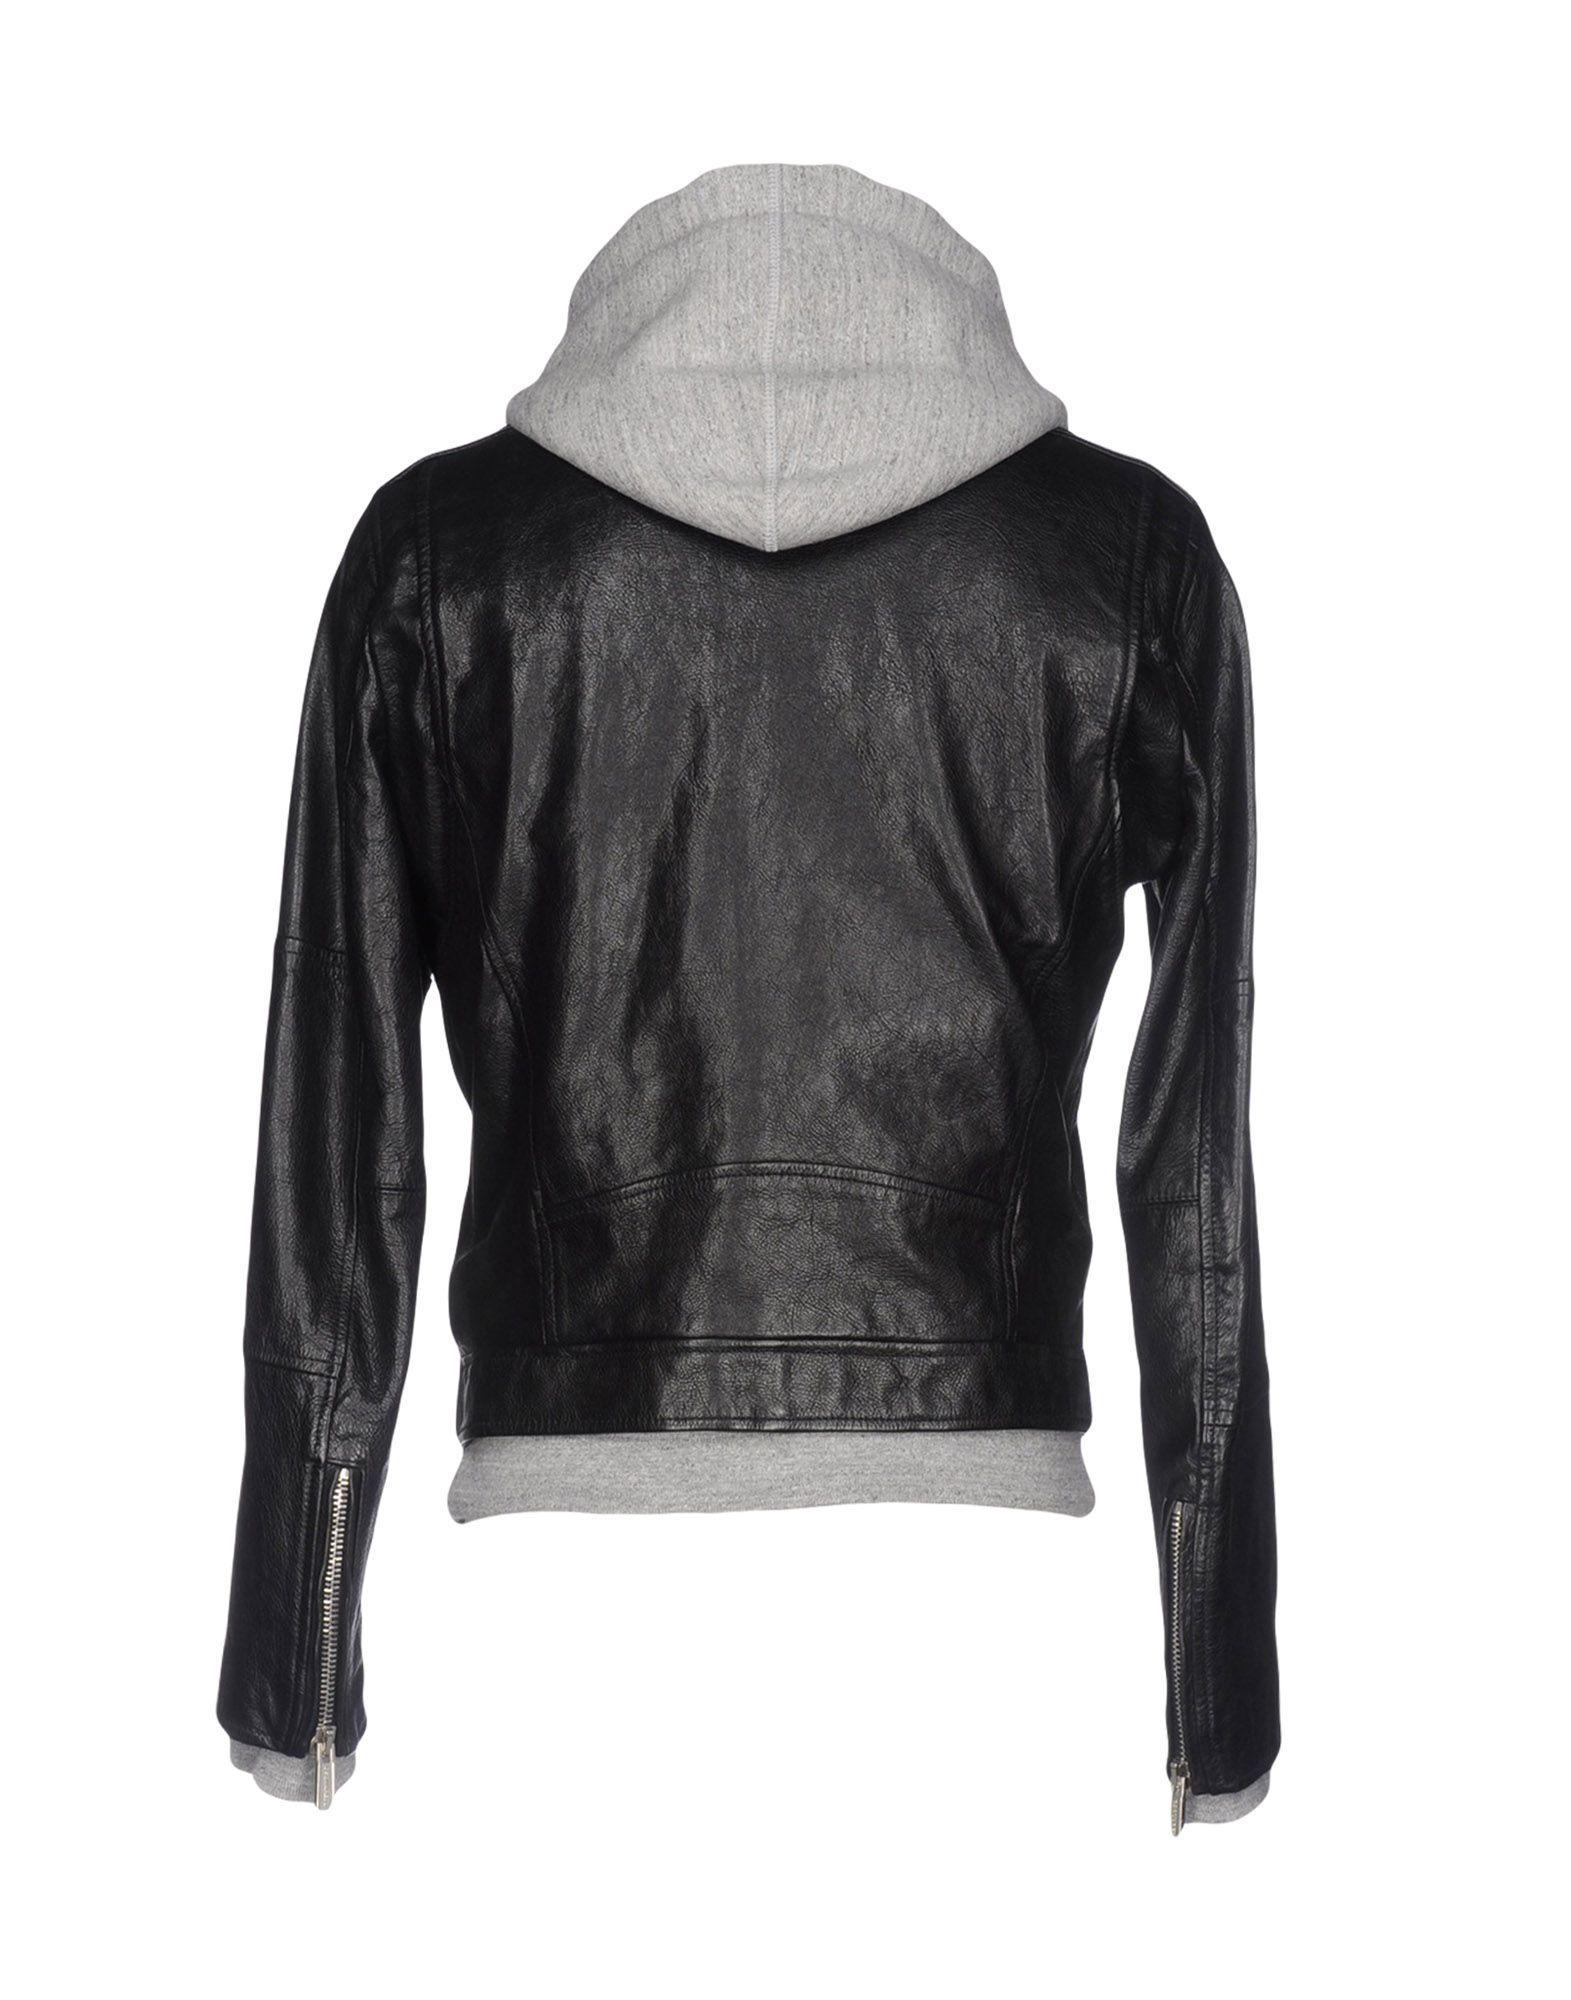 DSquared² Fleece Jacket in Black for Men